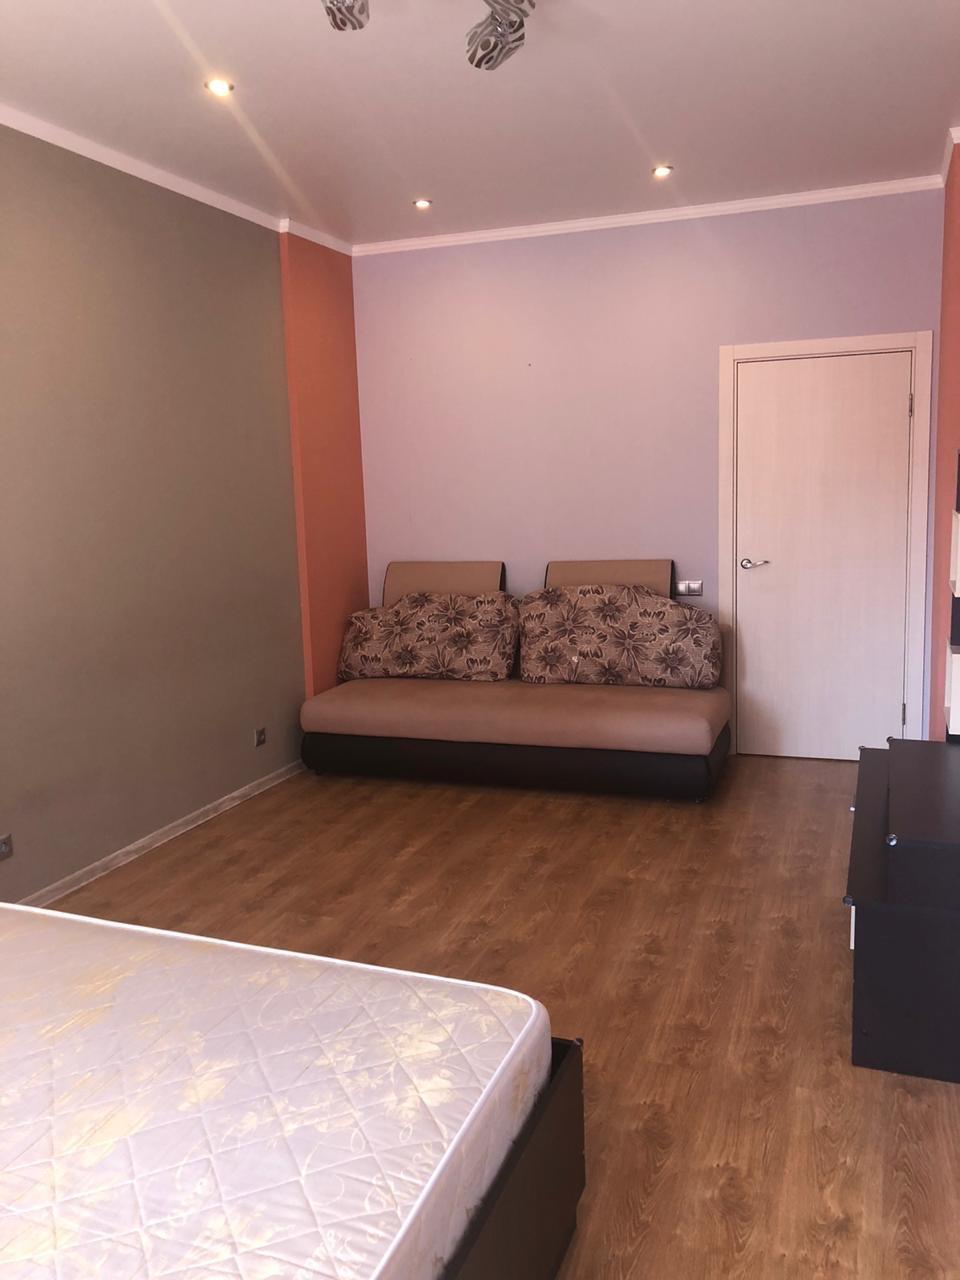 Квартира, 1 комната, 47 м² в Коммунарке 89055769697 купить 3